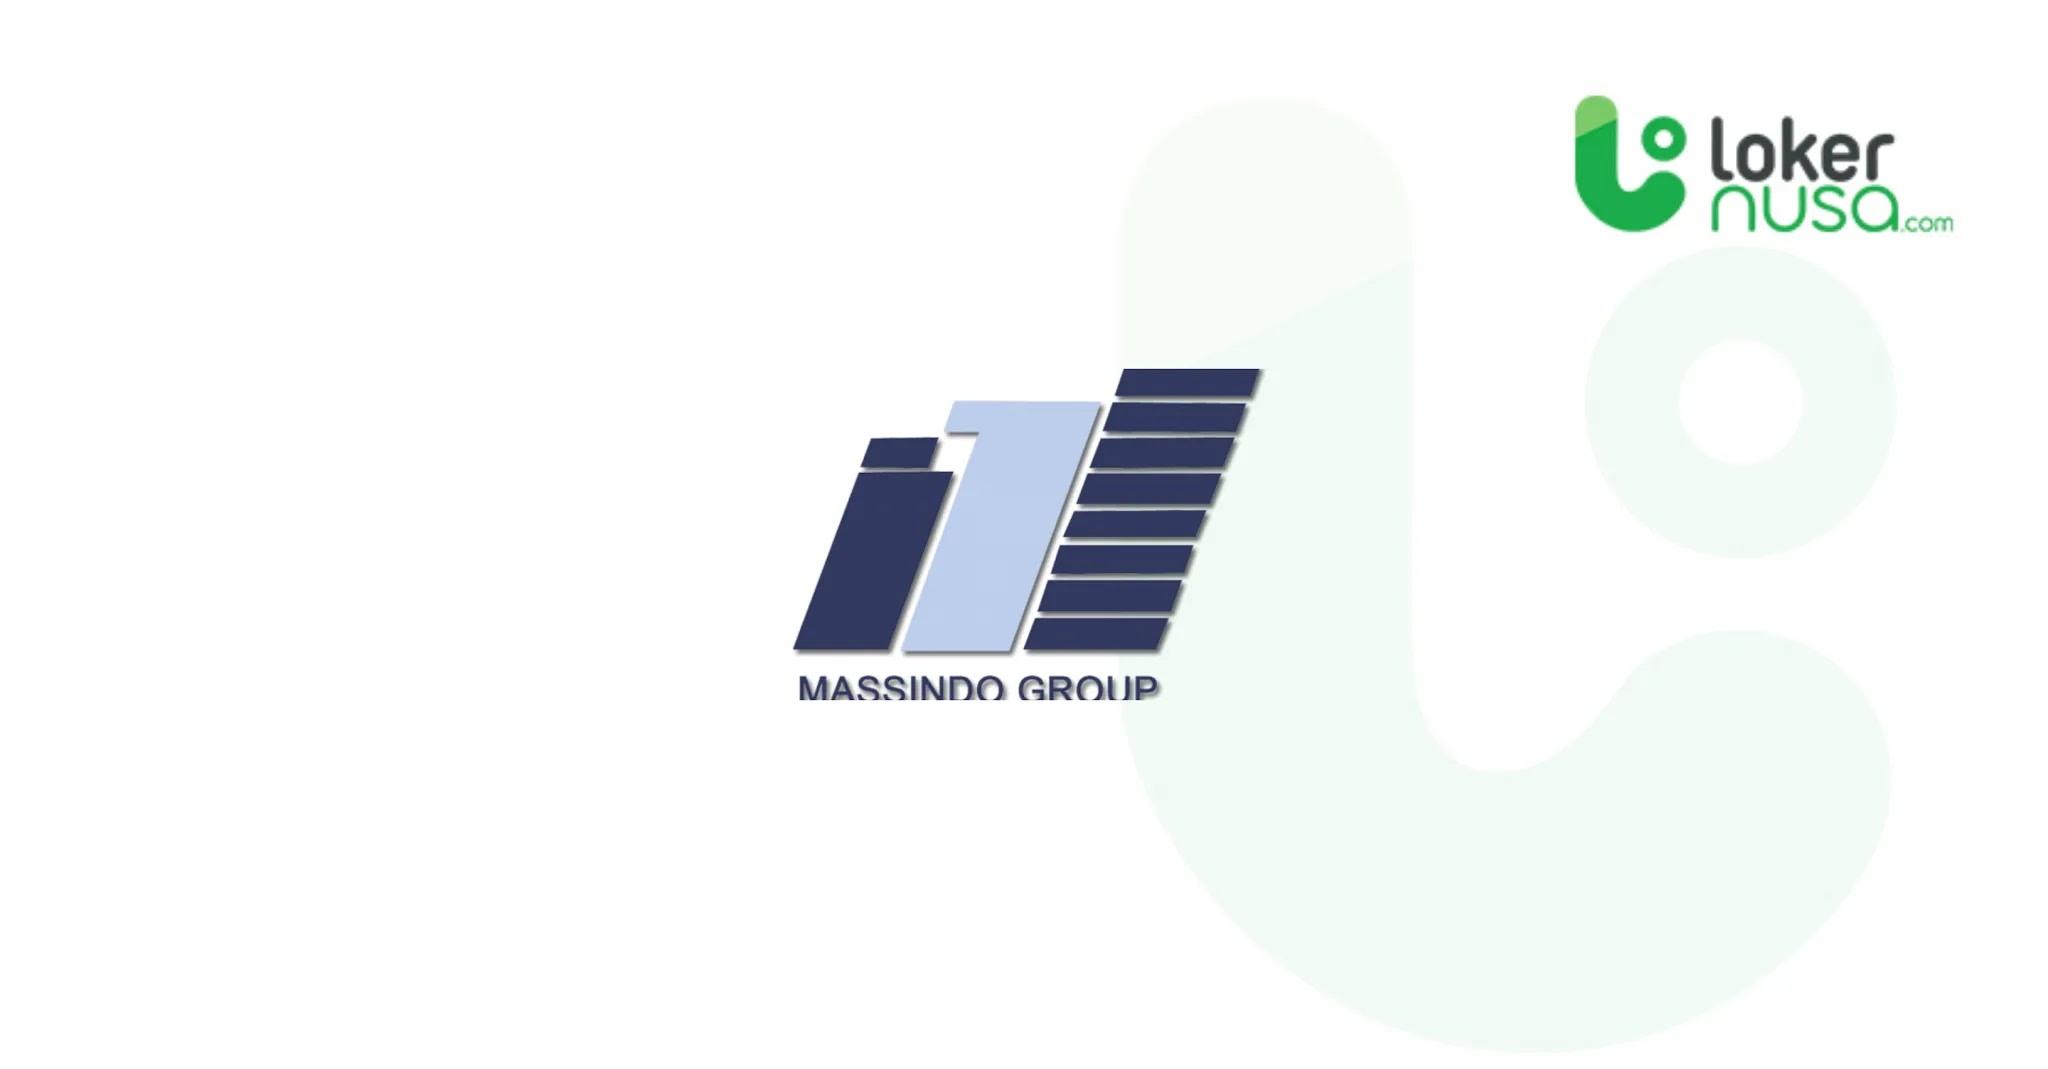 Lowongan Kerja Juli 2021 Massindo Group